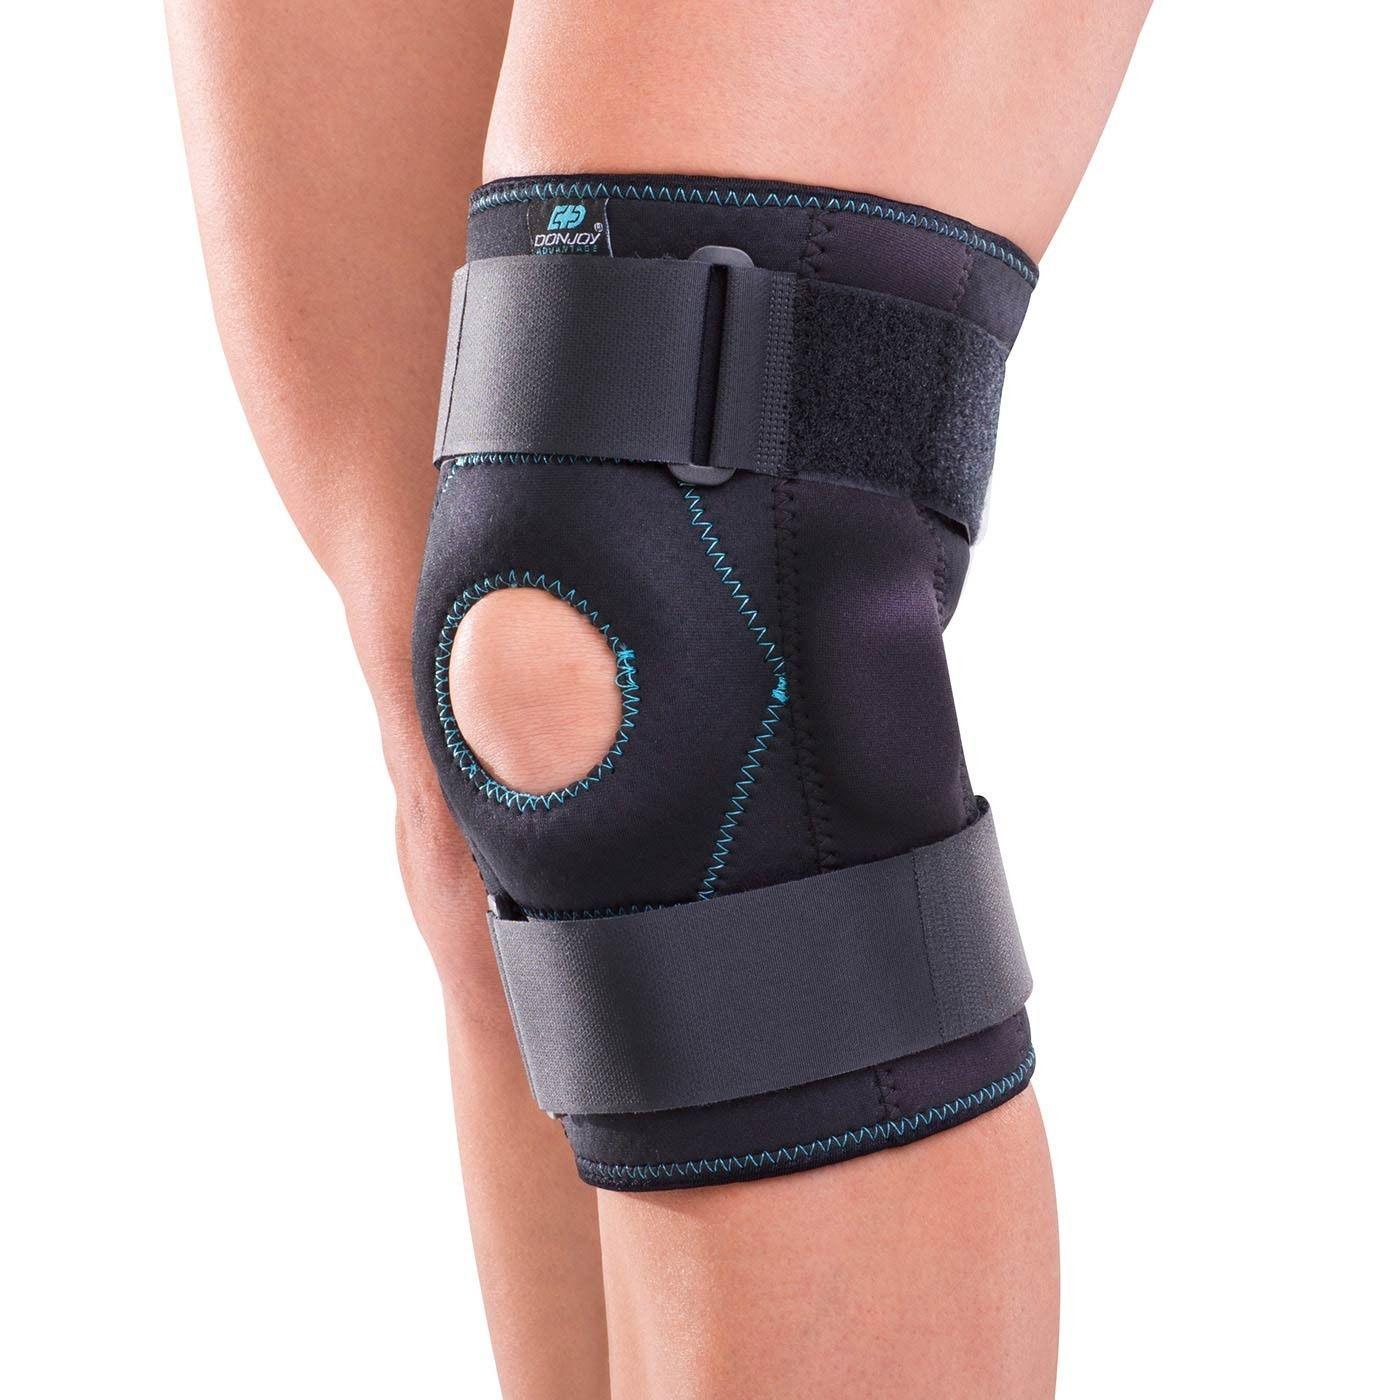 Donjoy advantage stabilizing hinged knee wrap knee wraps